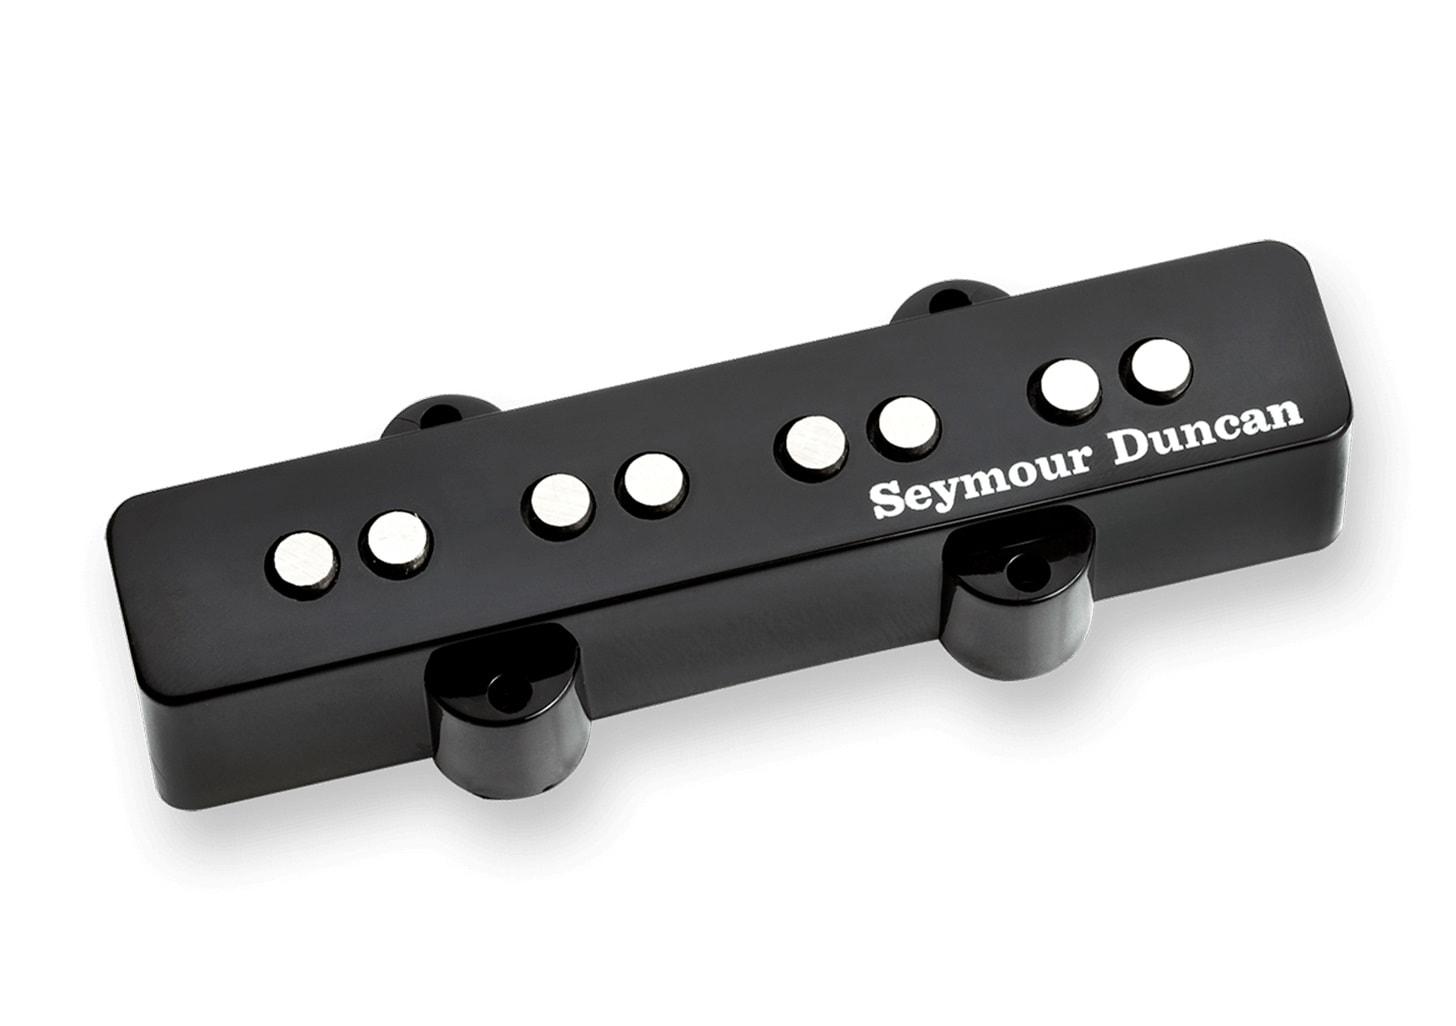 Seymour Duncan Noiseless Jazz Bass Pickups : seymour duncan stkj2b hot stack jazz bass bridge pickup black solo guitars ~ Vivirlamusica.com Haus und Dekorationen